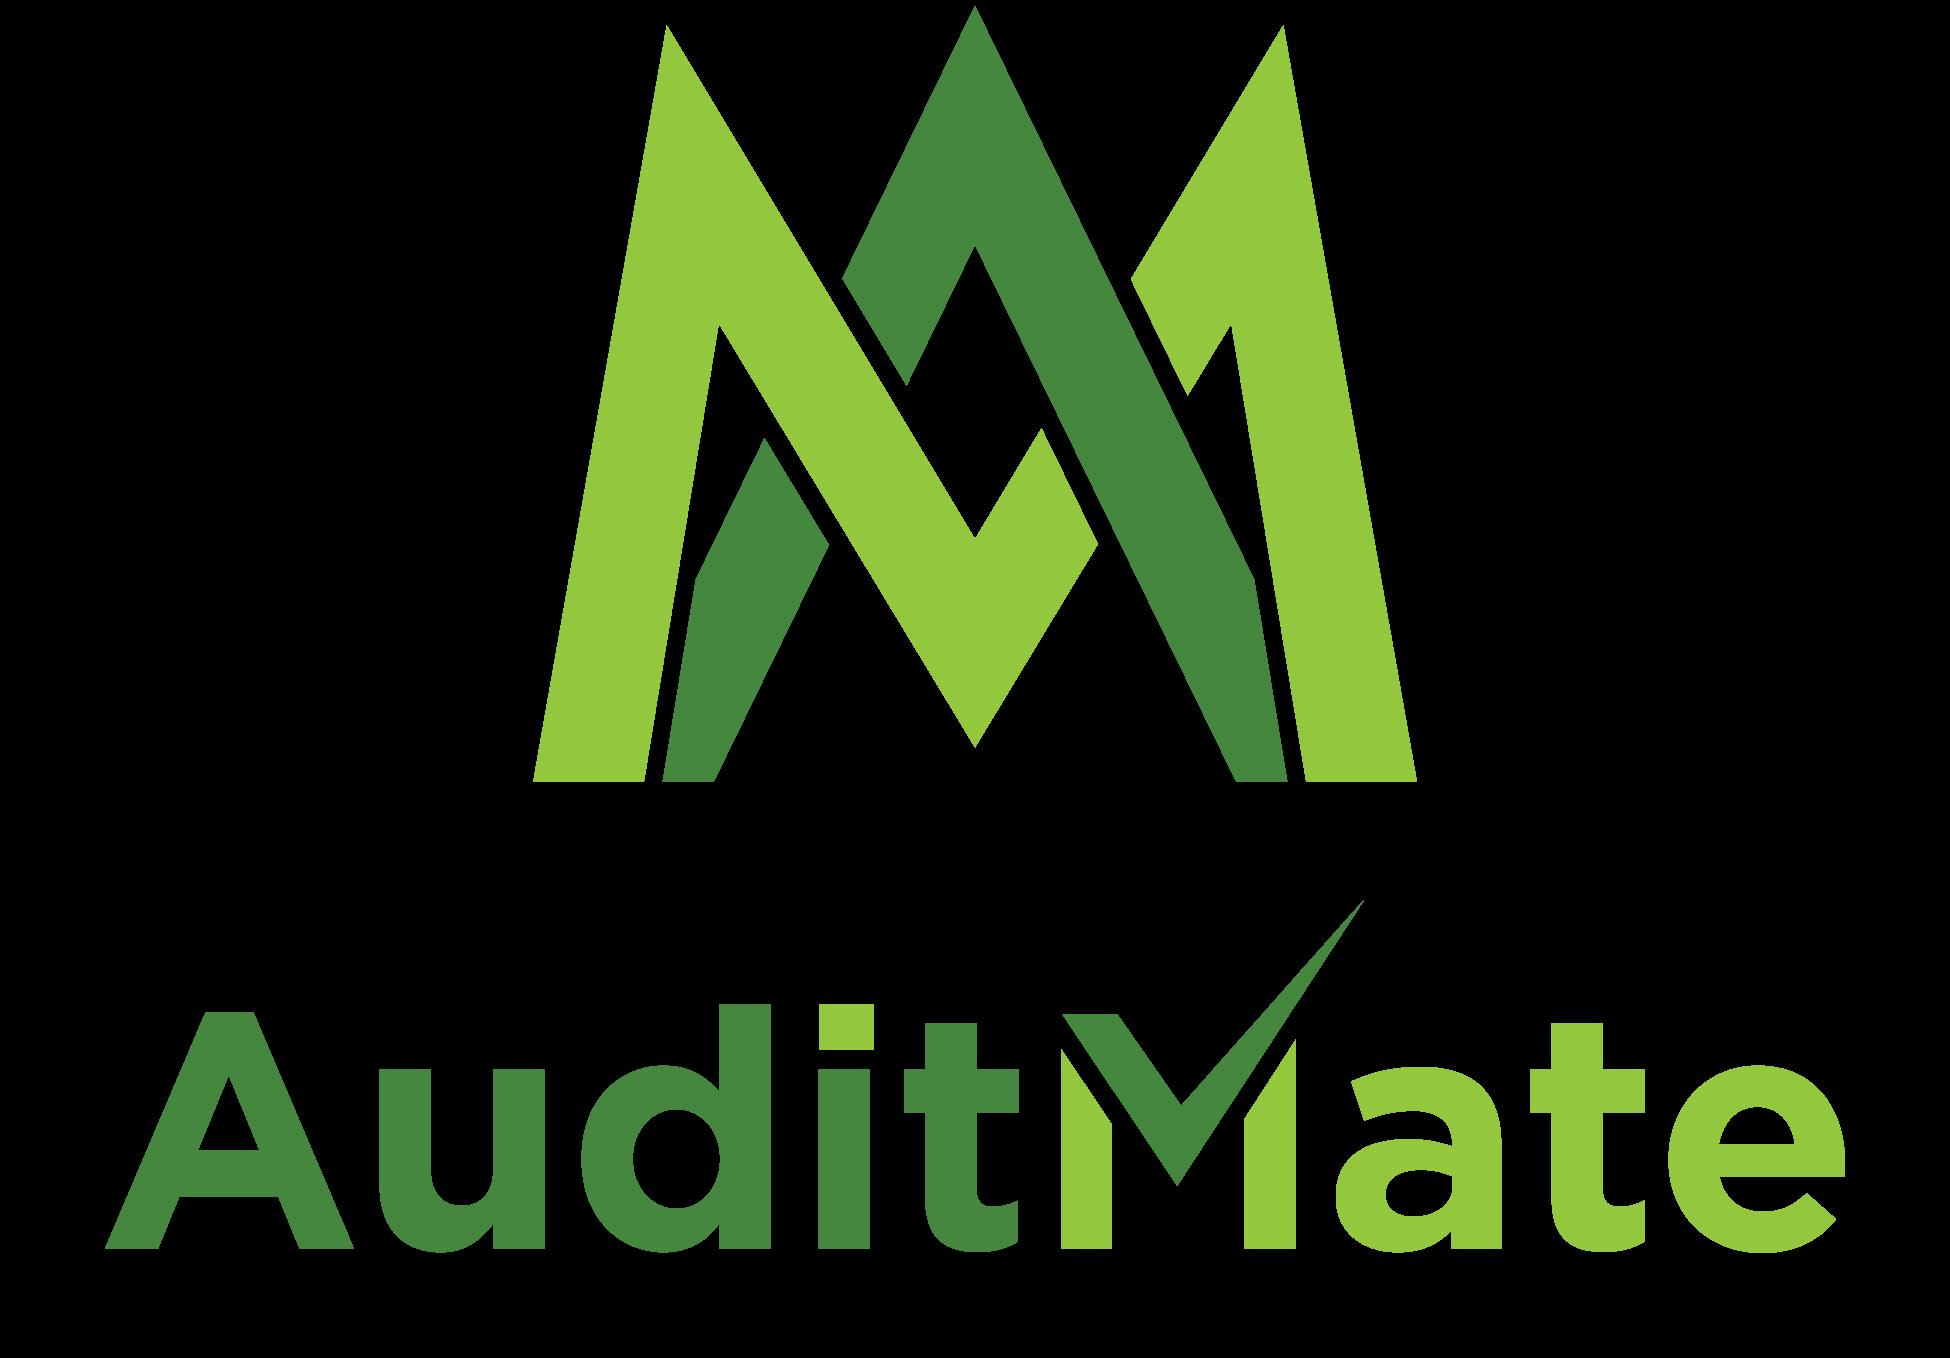 AuditMate